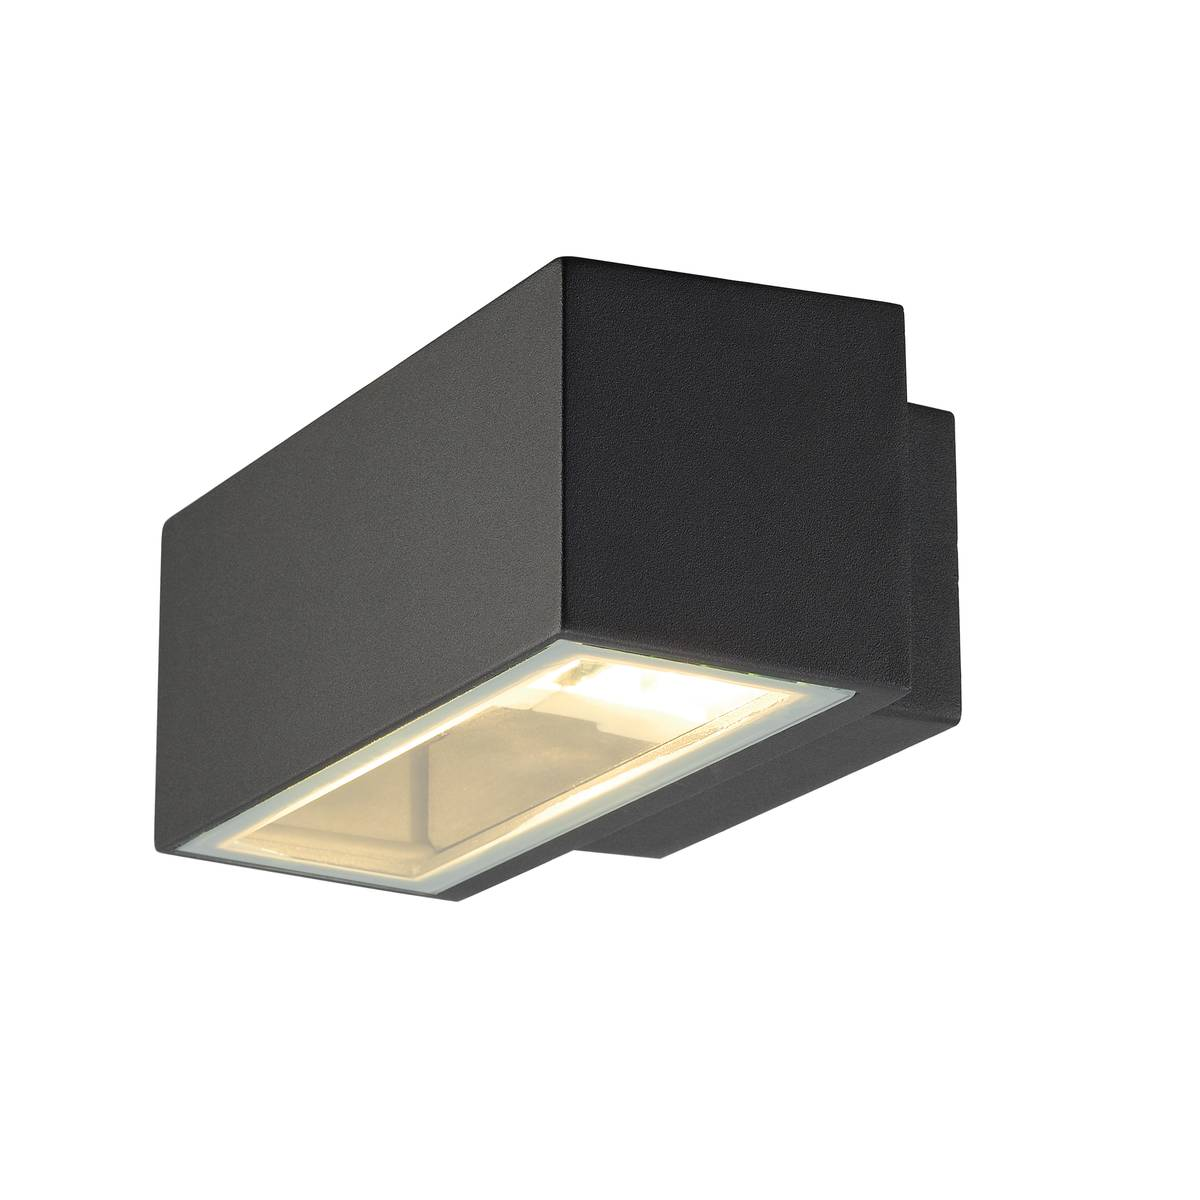 SLV buiten wandlamp Box R7S - antraciet